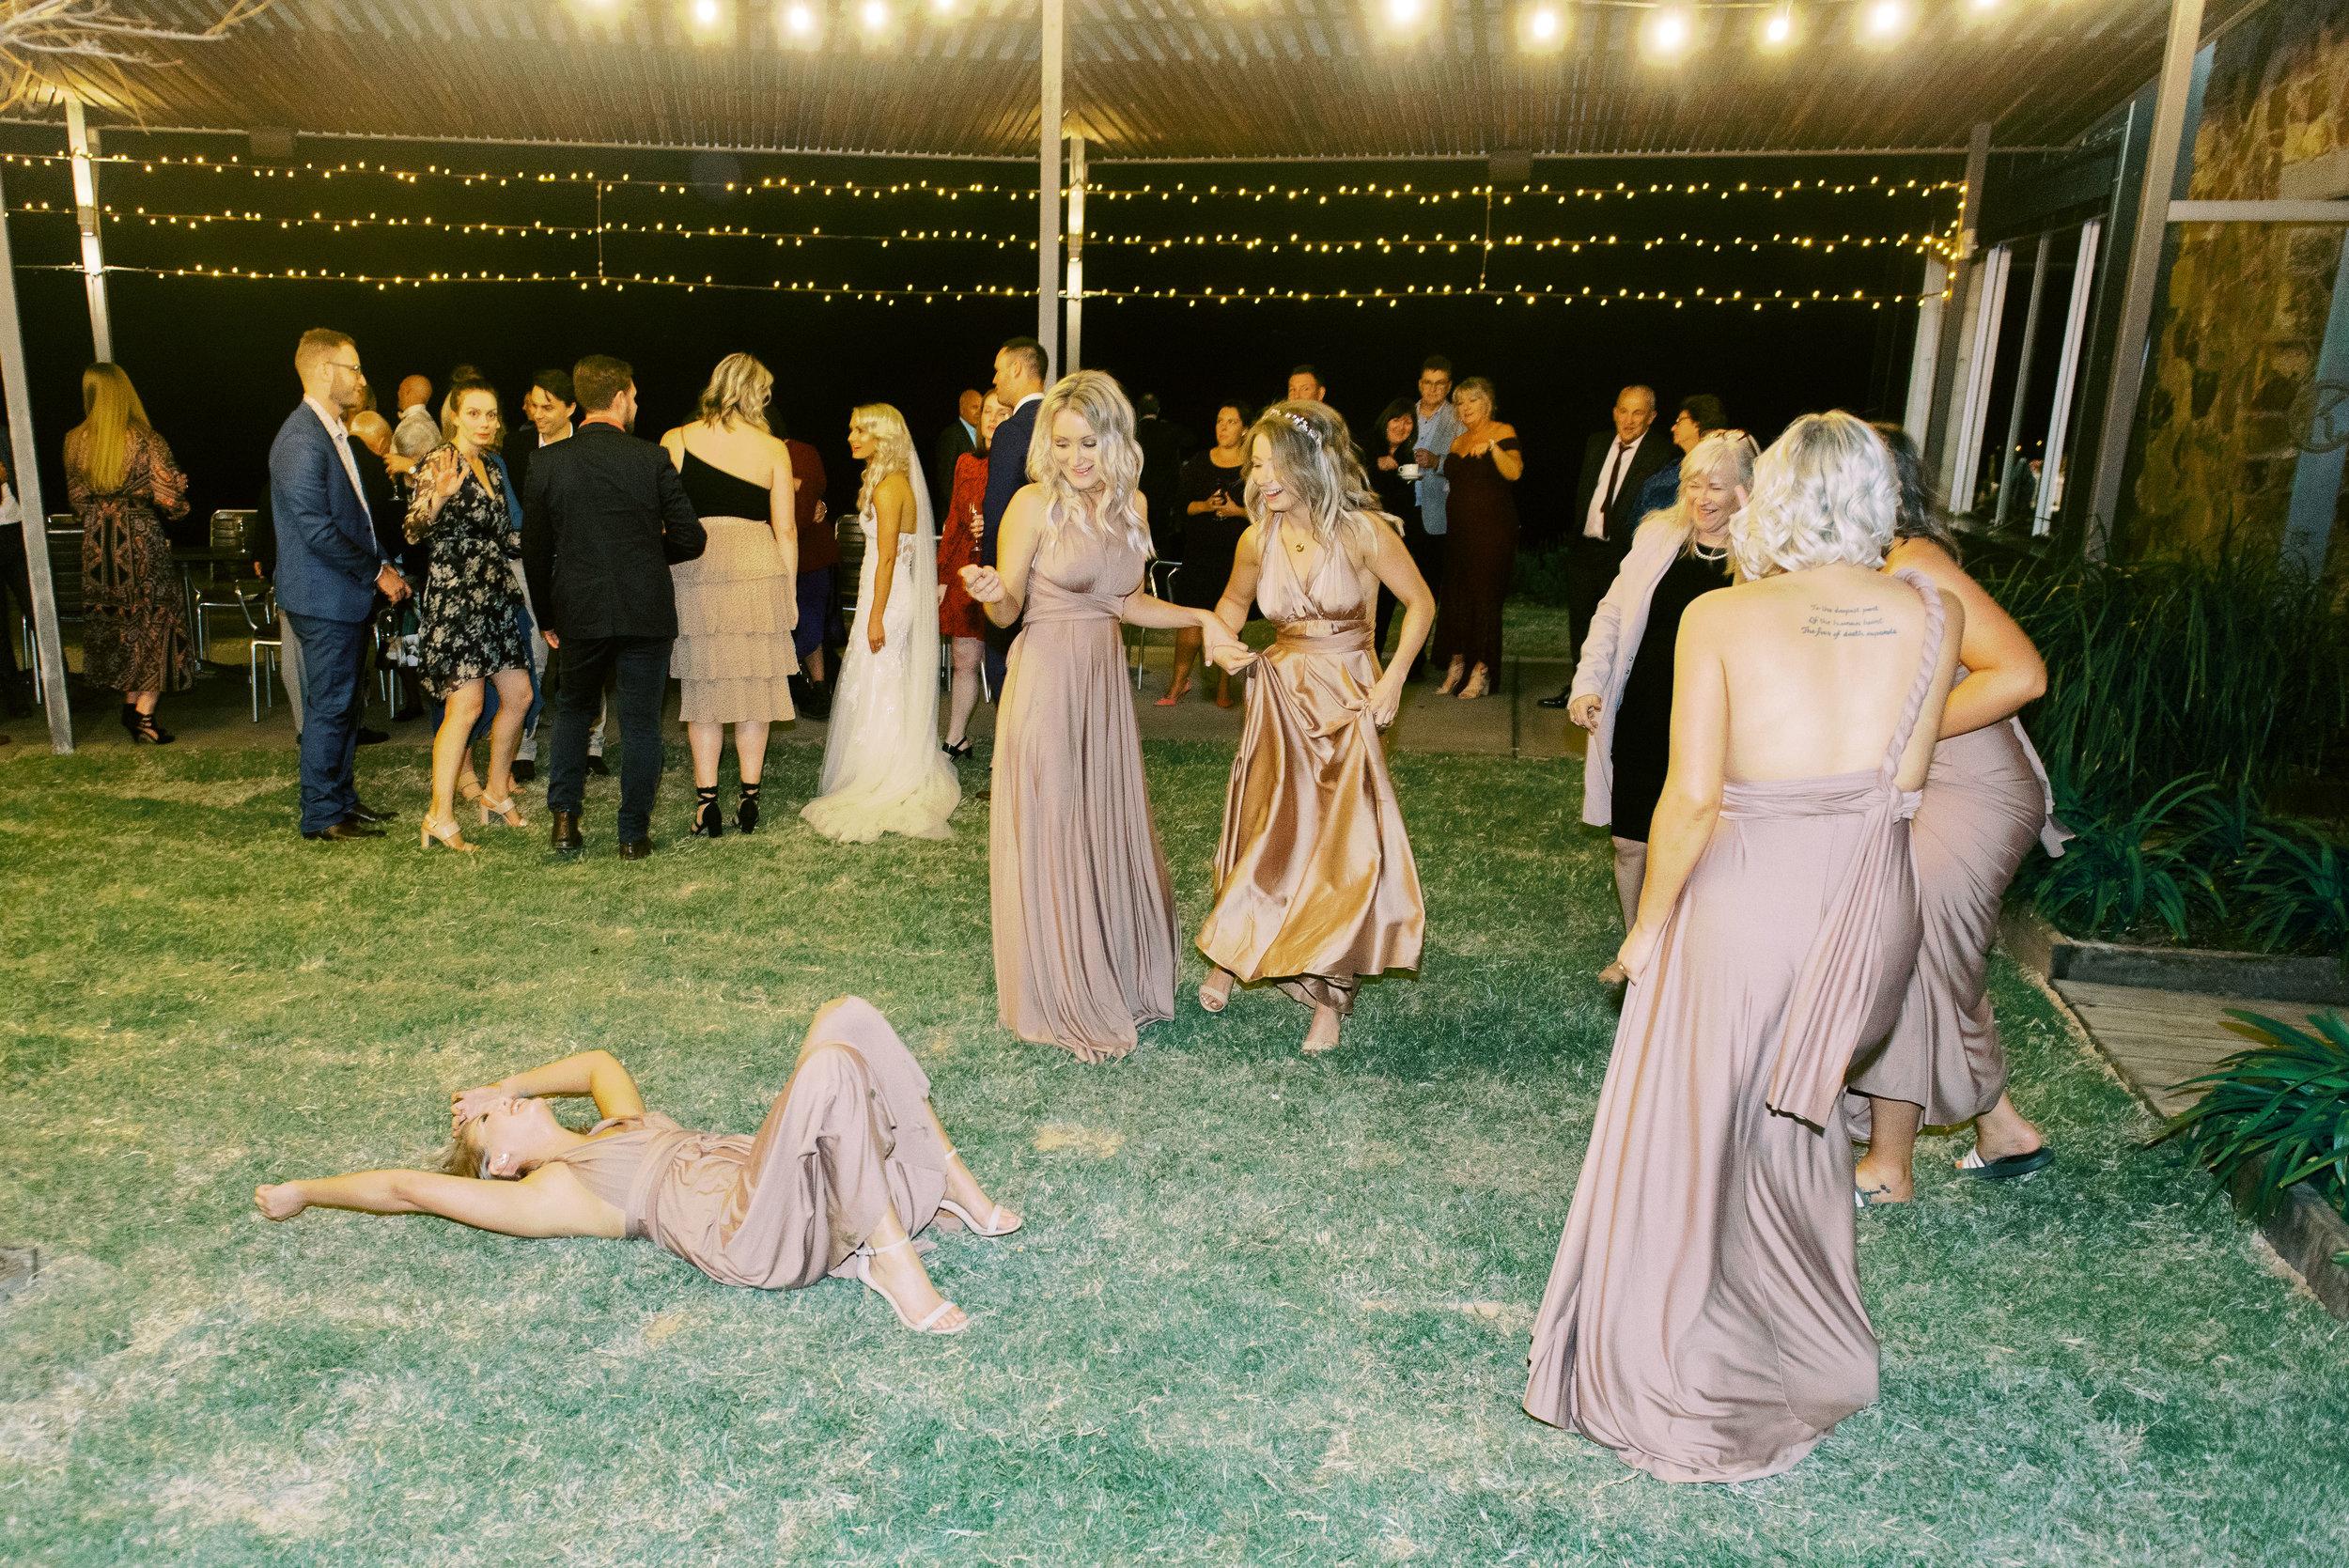 Kooroomba-Vineyard-Lavender-Farm-Wedding-Fine-Art-Lauren-Olivia-91.jpg